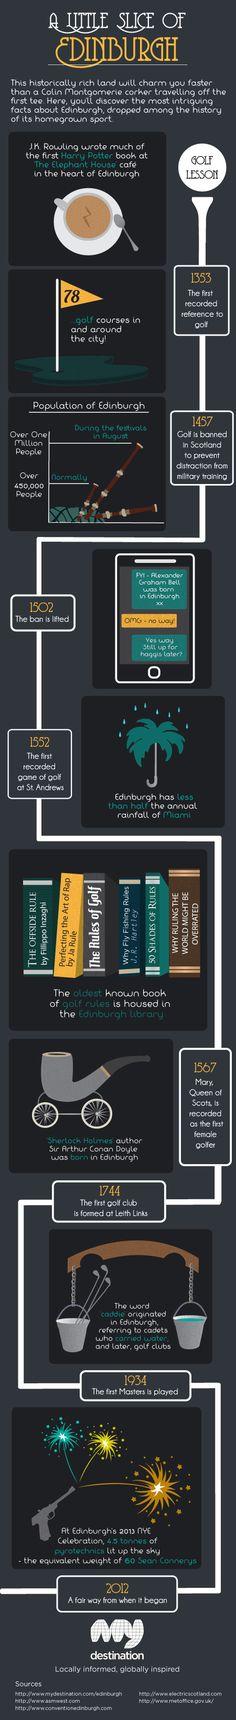 Anyone fancy a trip to Edinburgh?